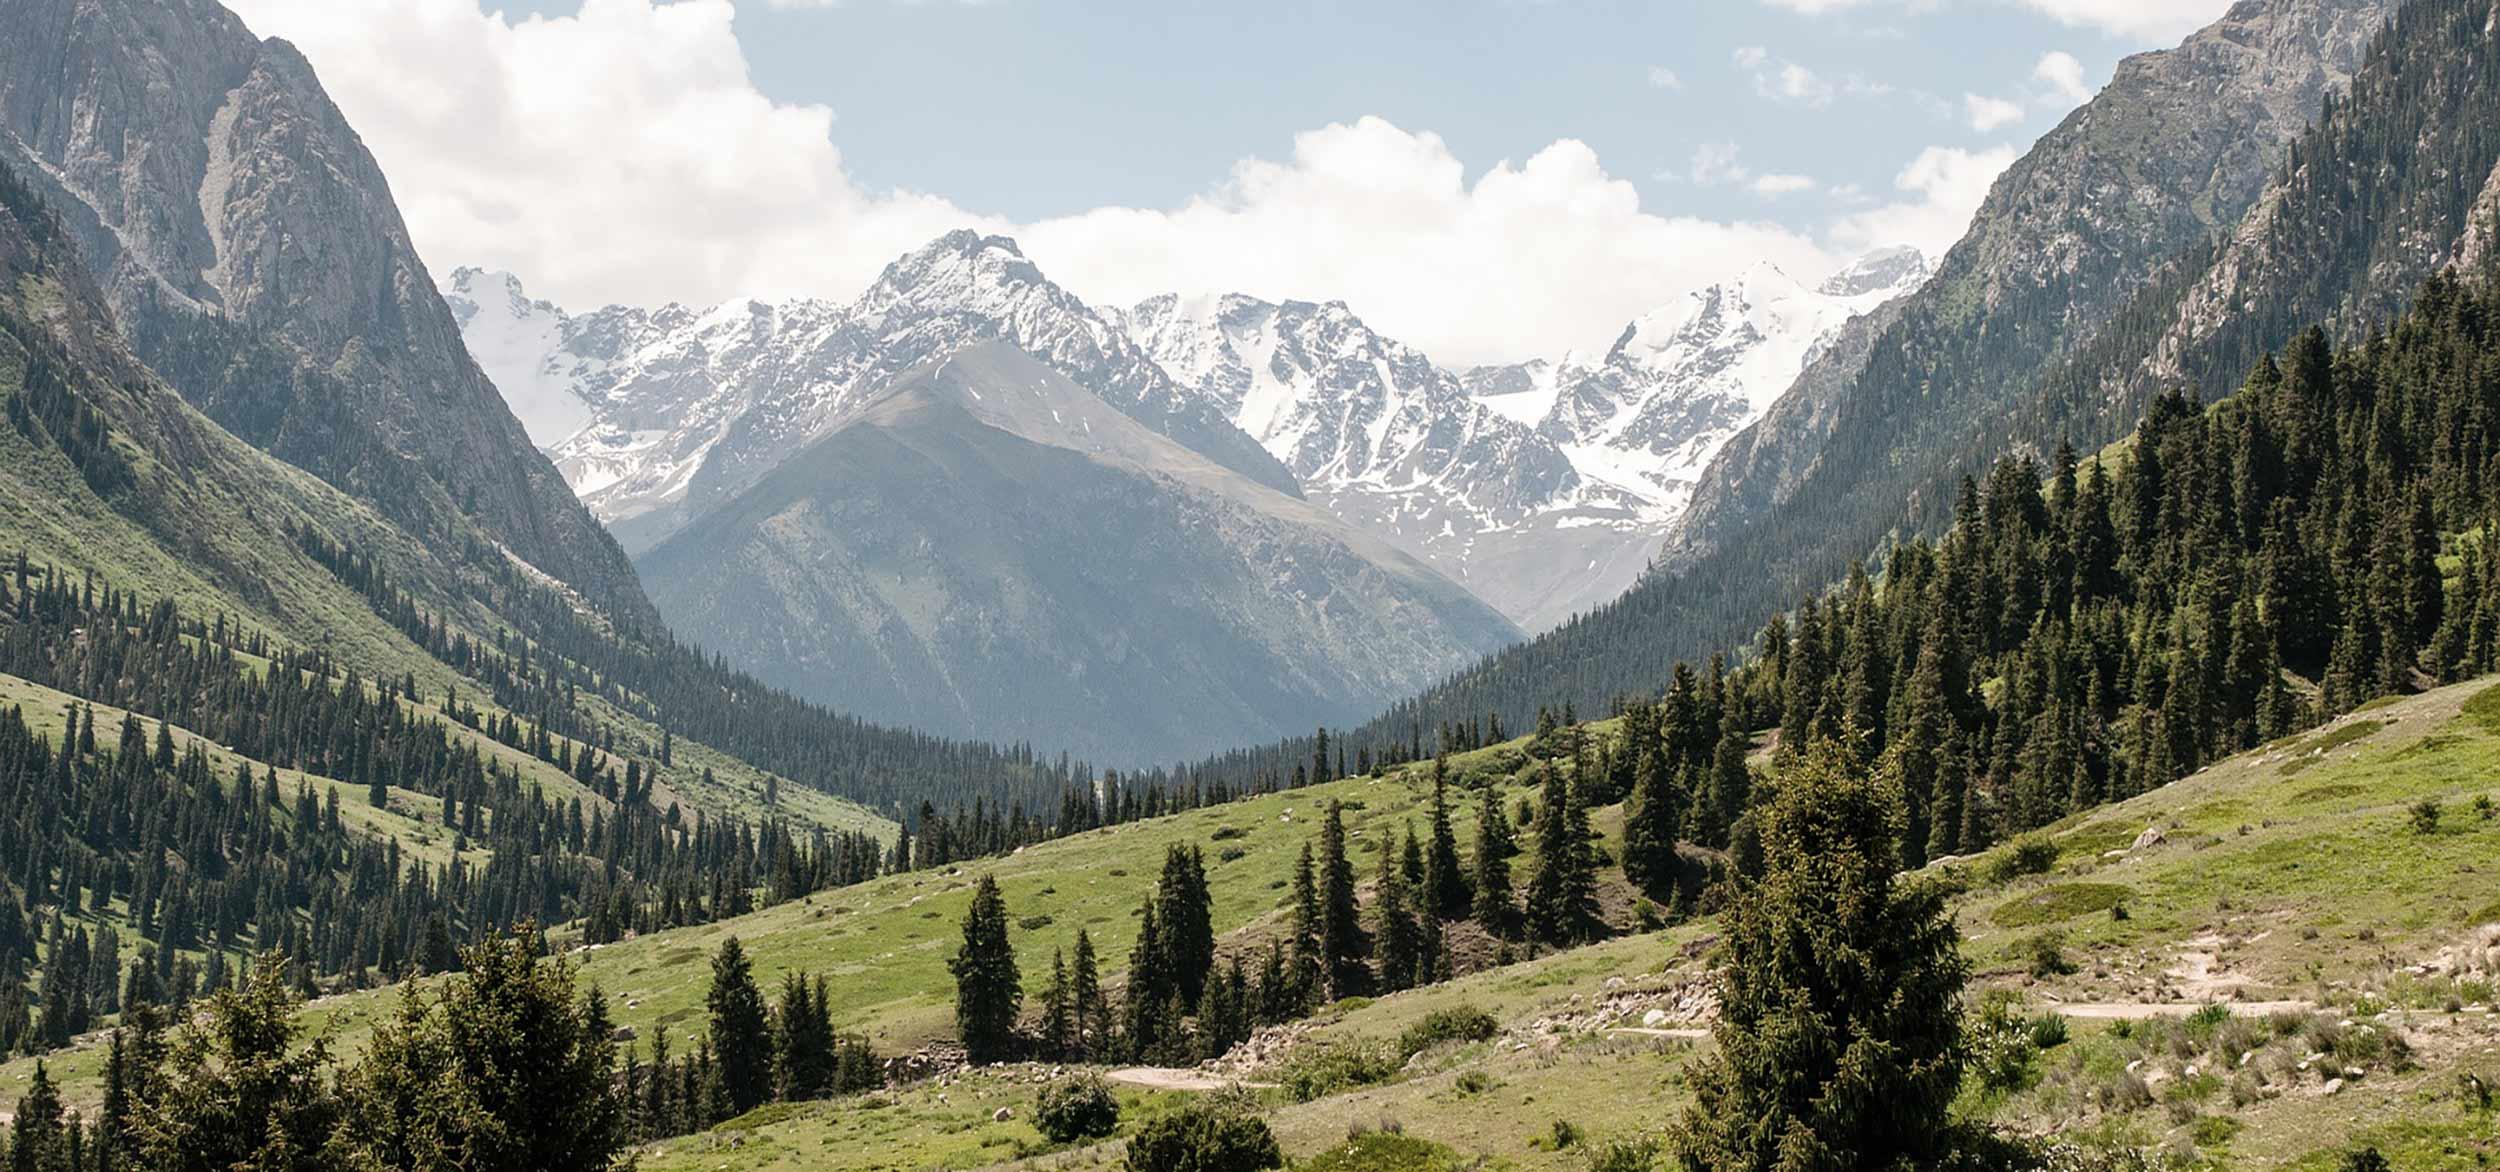 The Kyrgyzstan Mountains. Bikepacking   Apidura